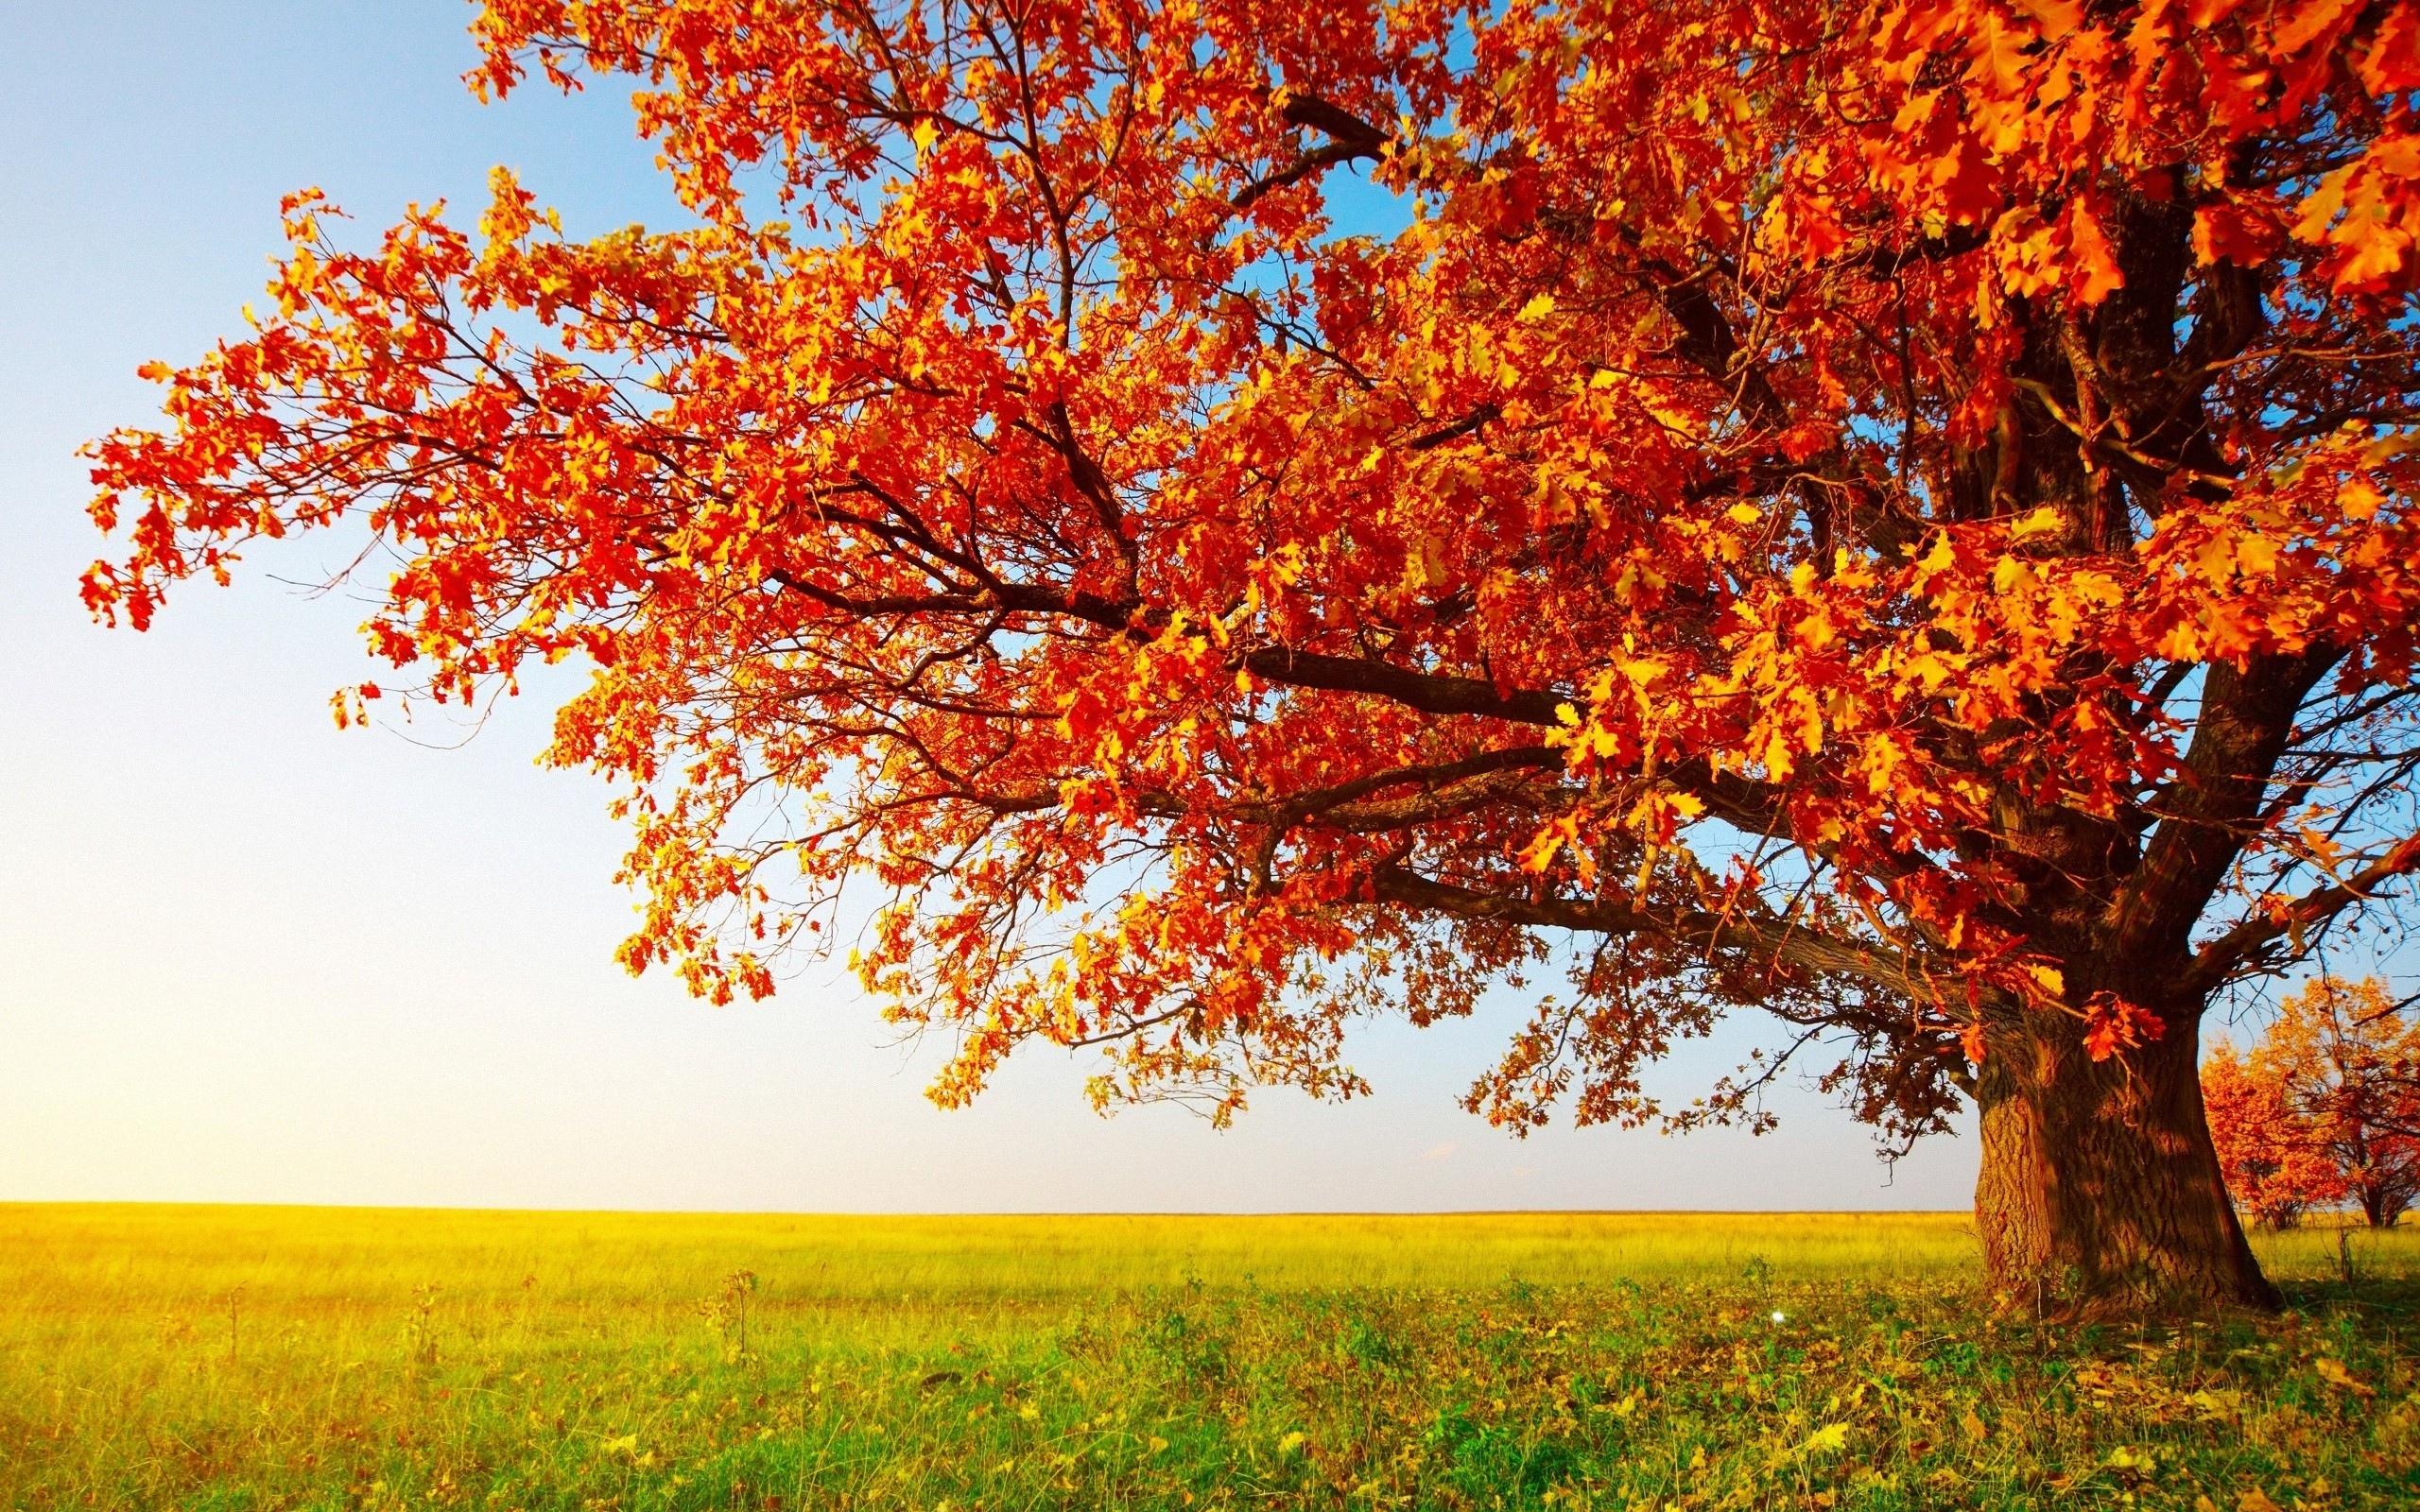 Download Big Autumn Tree Wallpaper Wallpapers 2560x1600